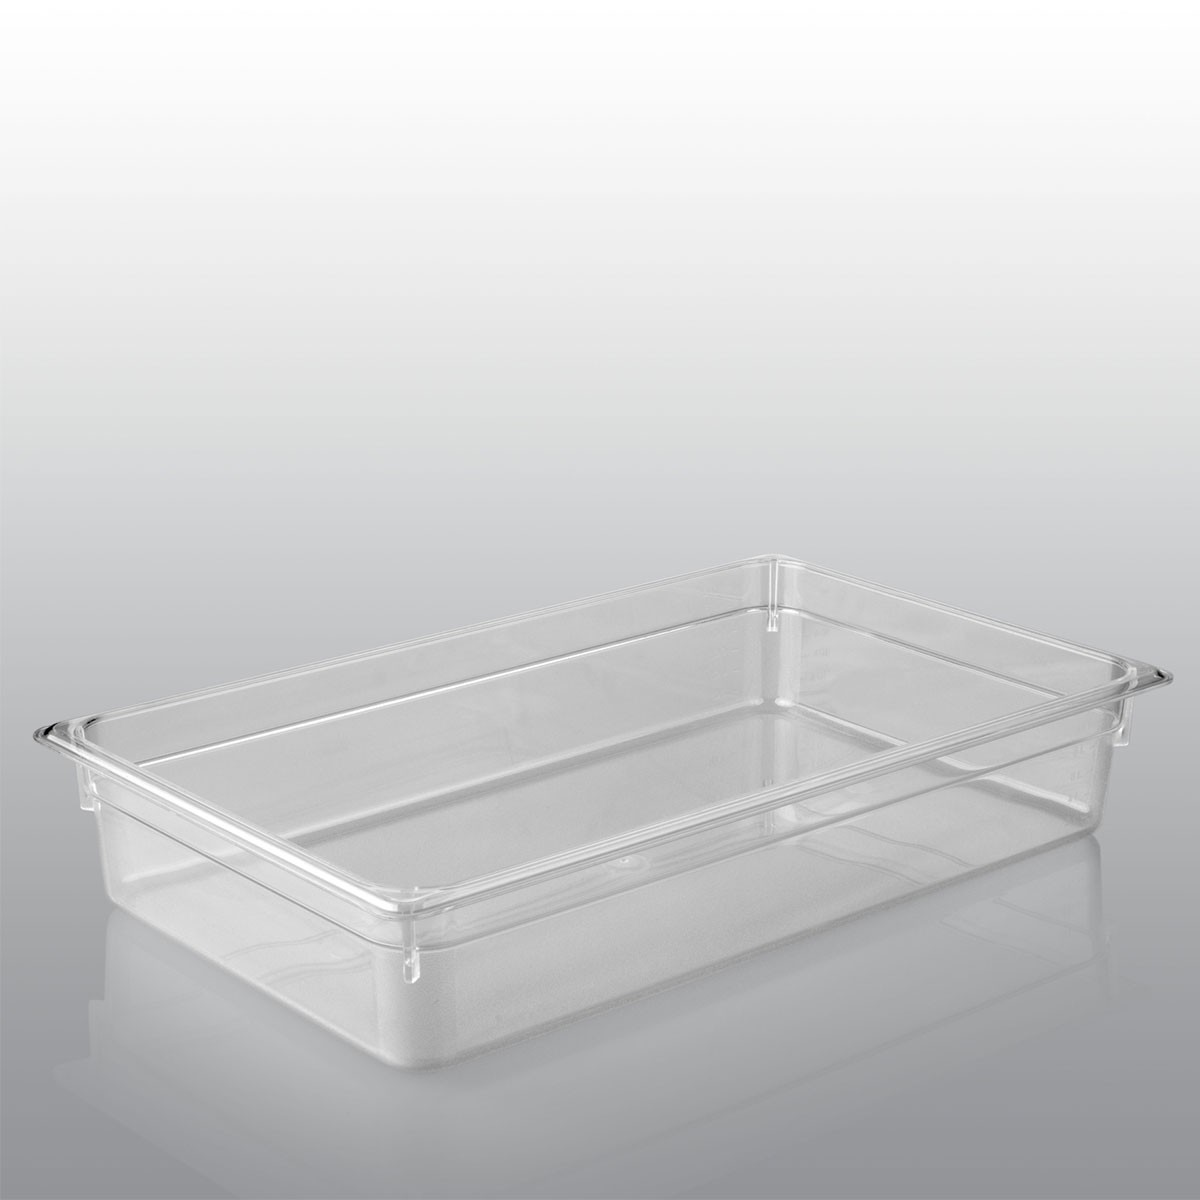 GN-Behälter GN 1/1 aus Polycarbonat (Tiefe: 150mm) 21,0 L Saro